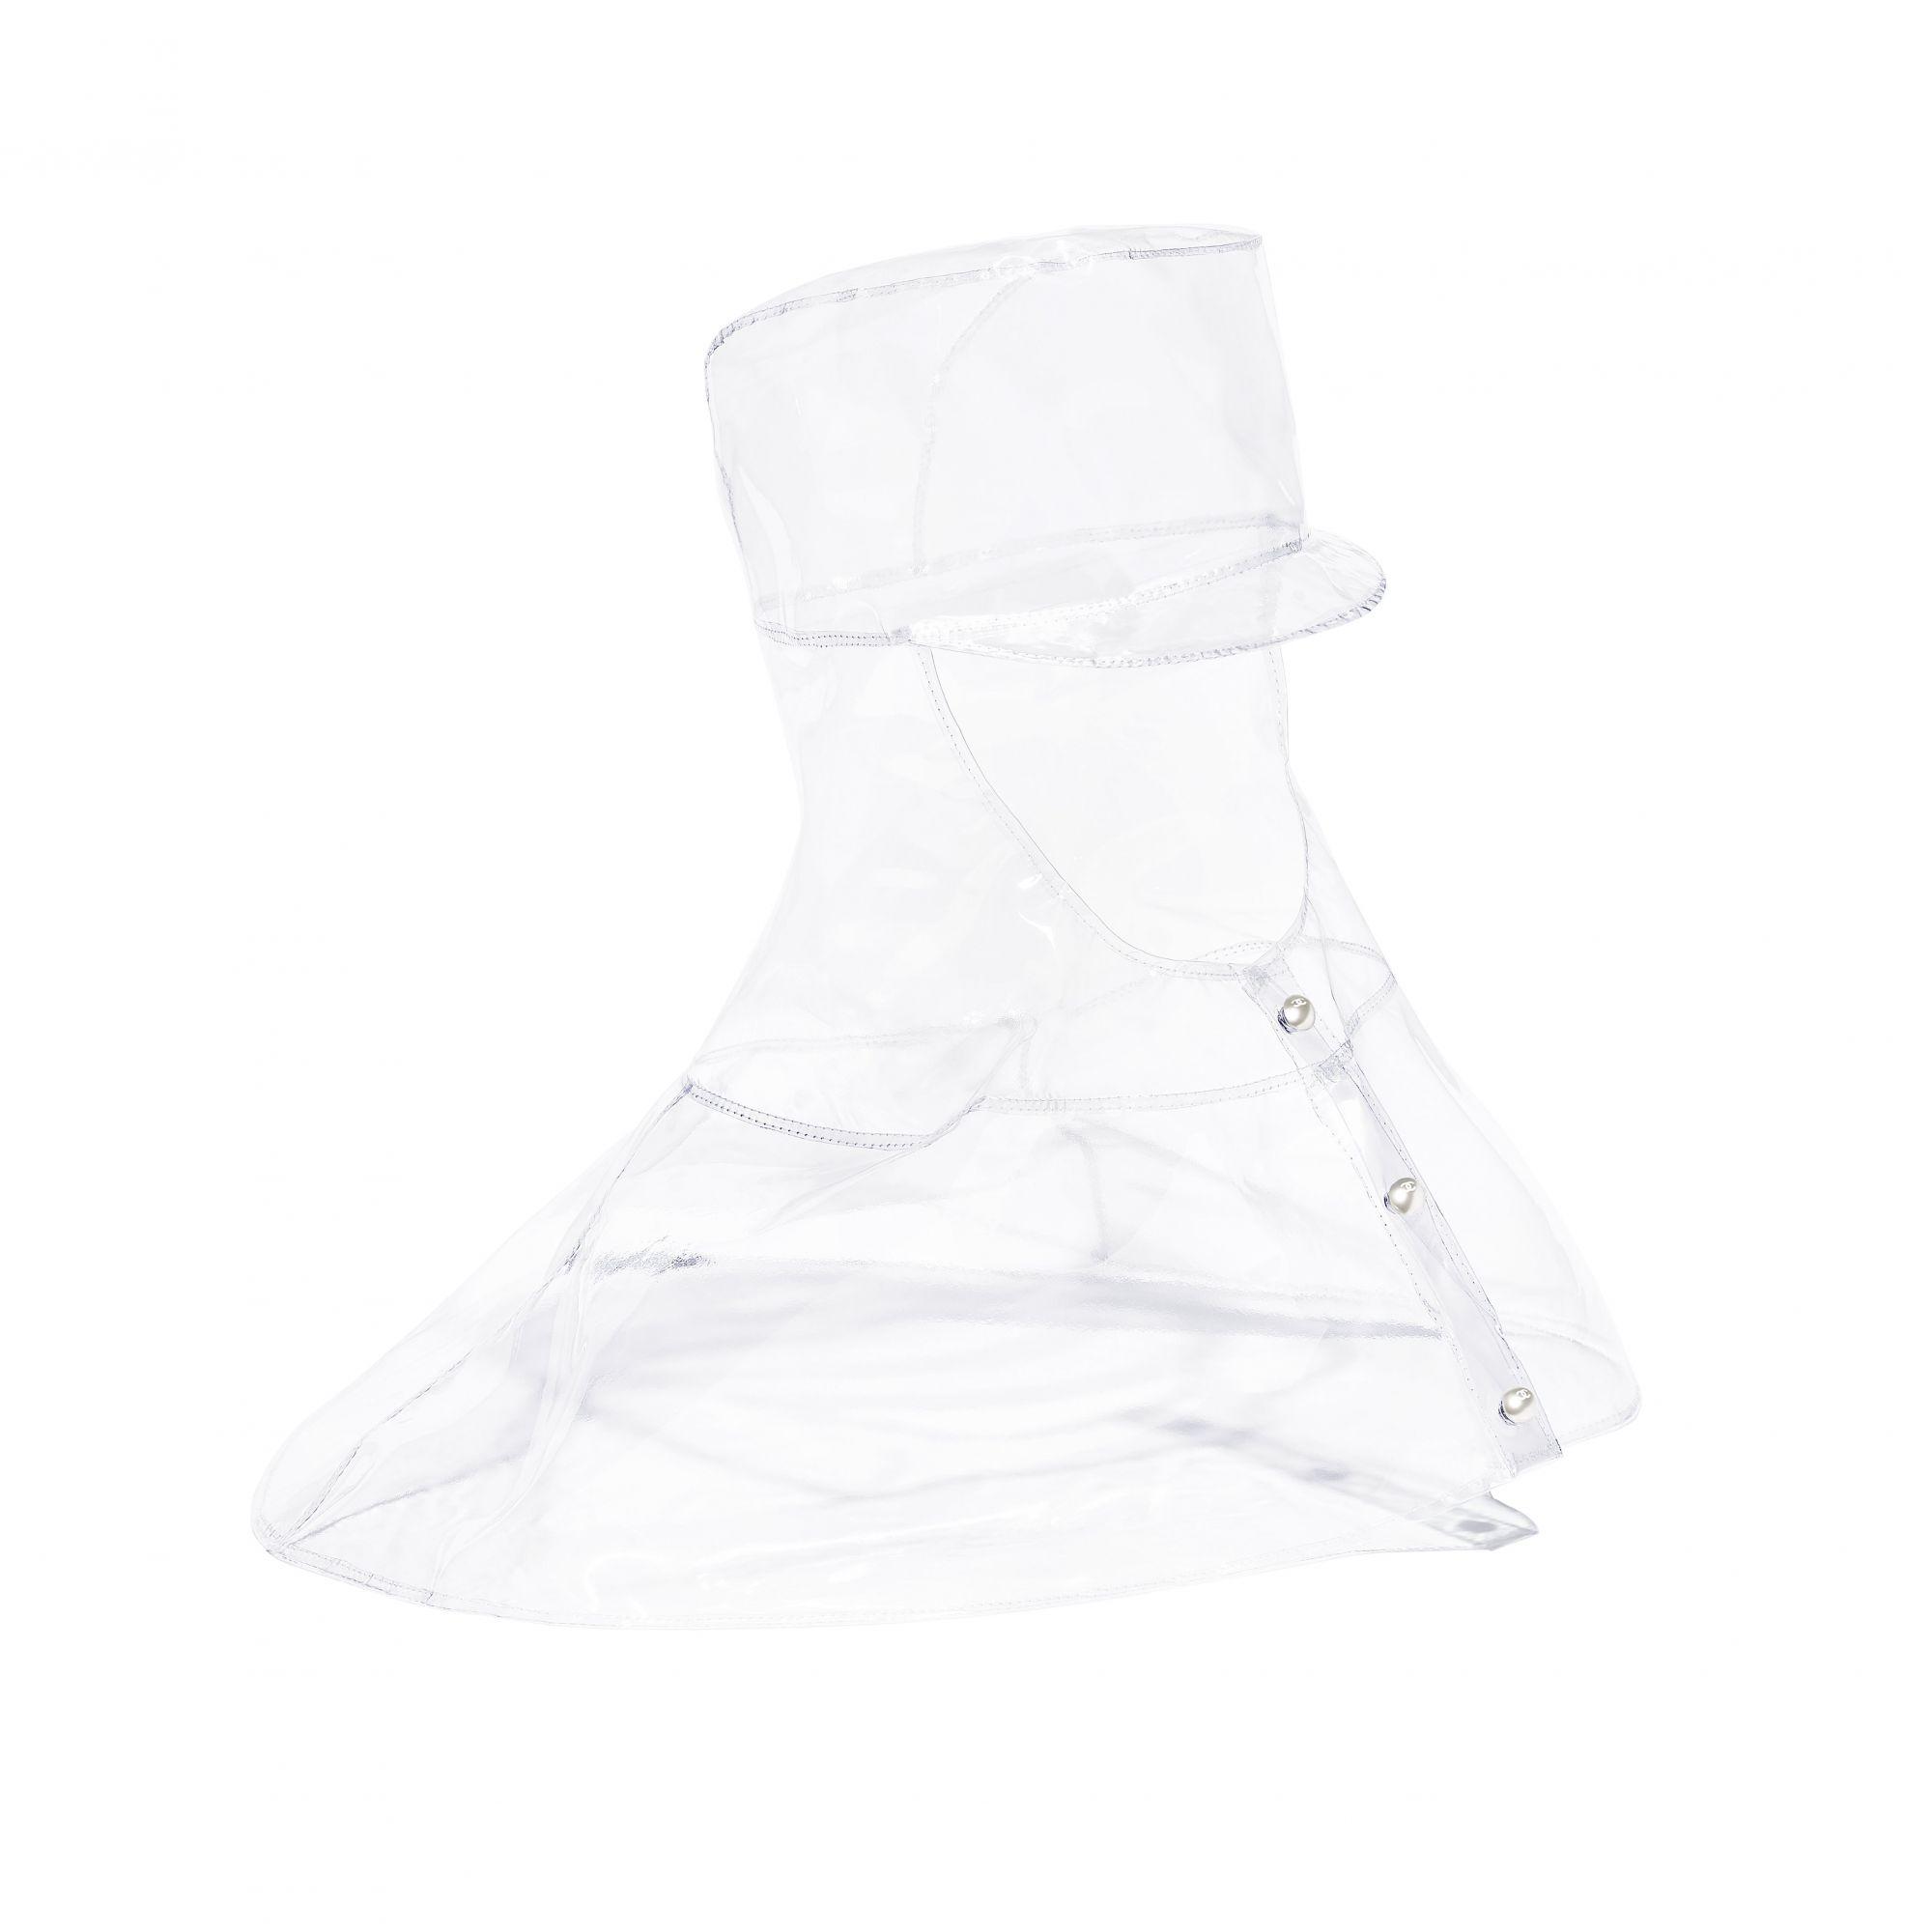 Hood in transparent PVC